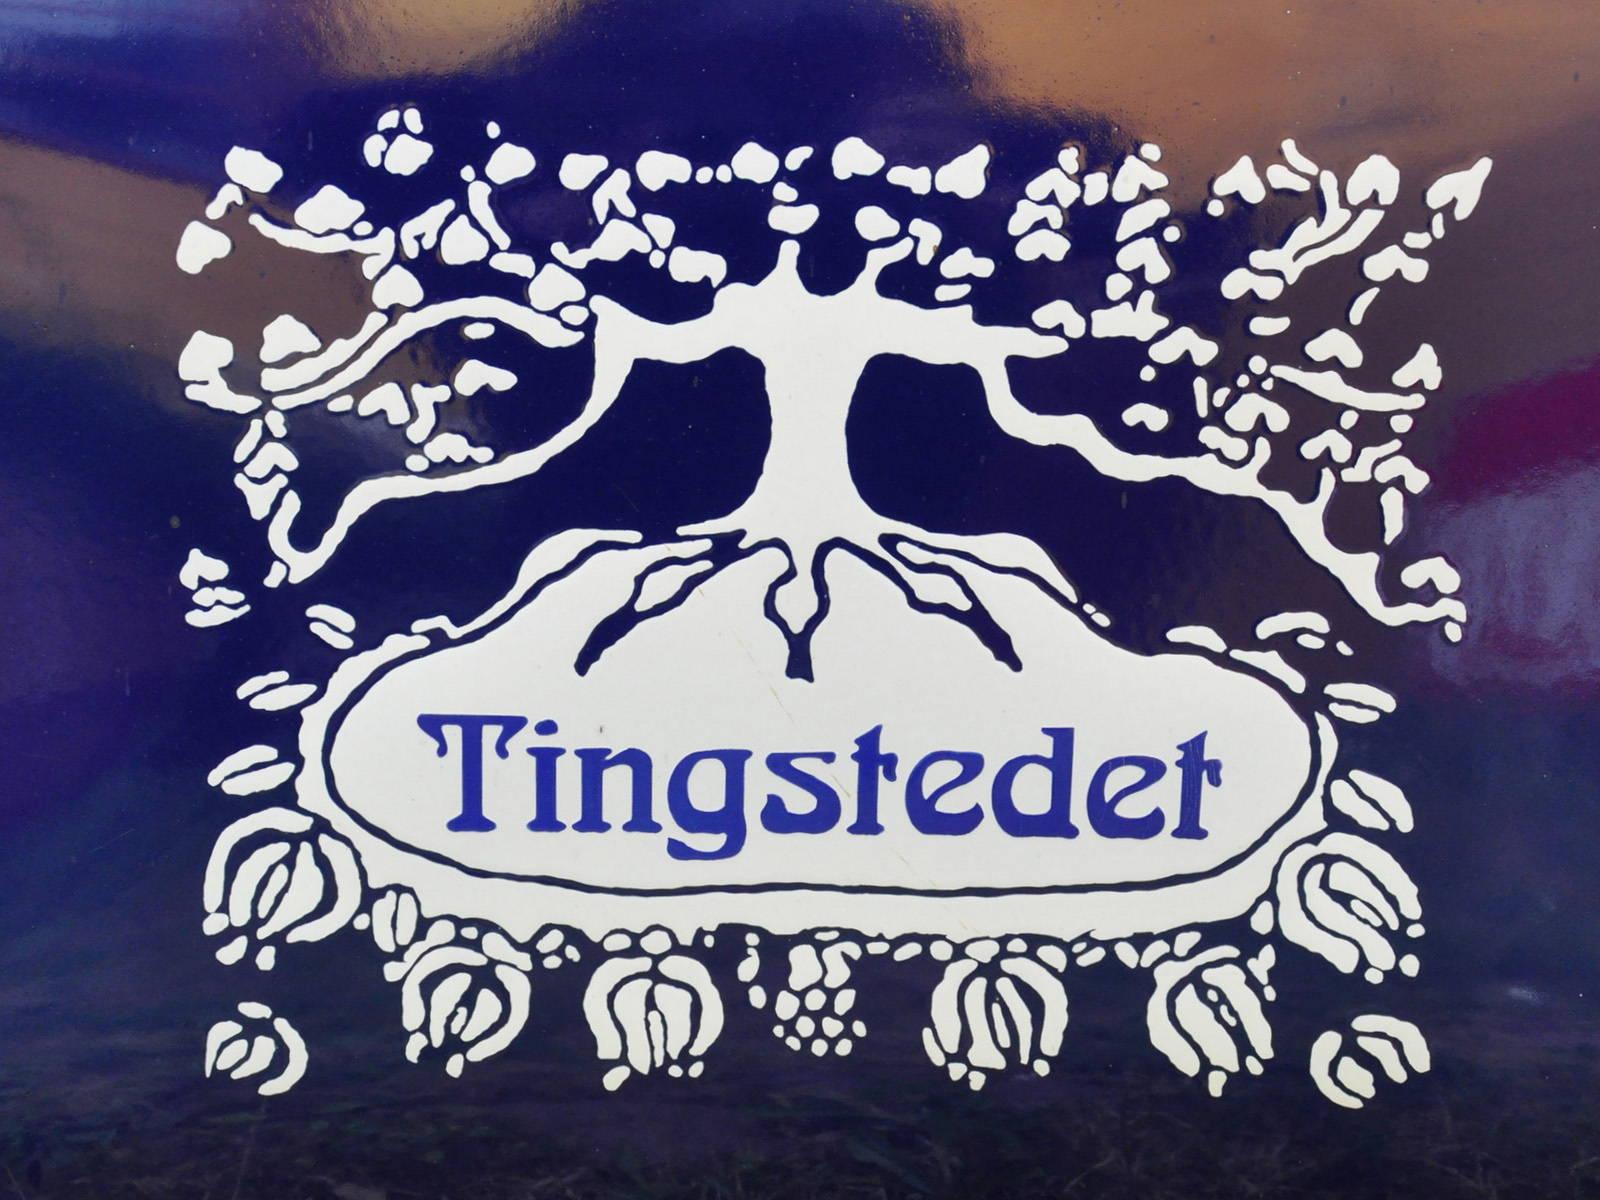 Tingstedet_web